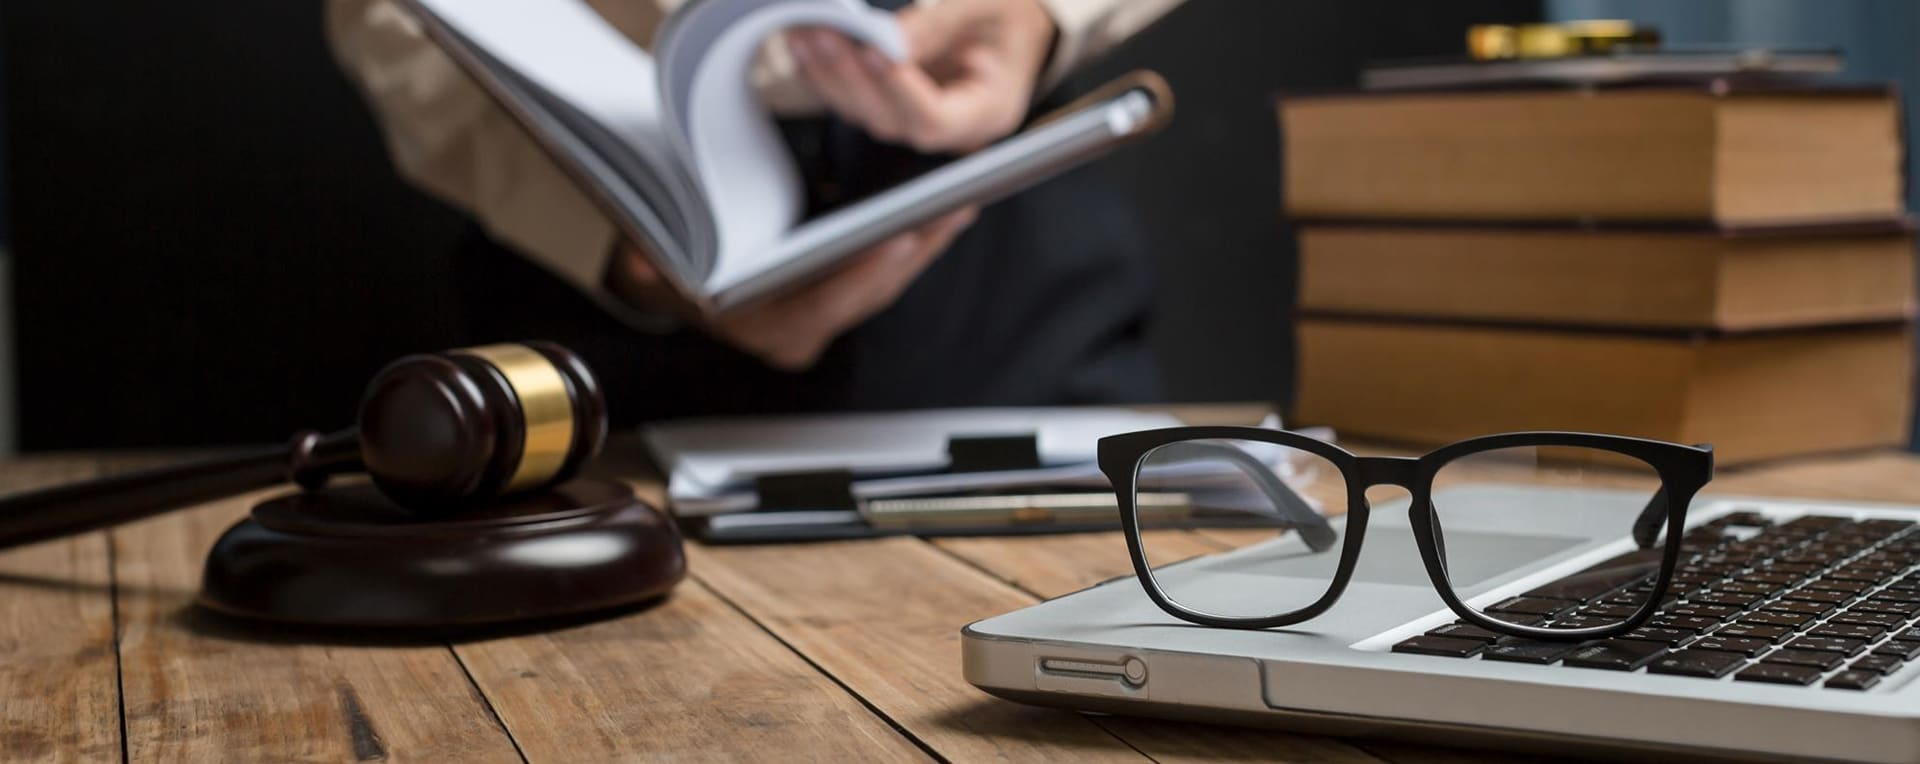 Employment Insurance Improvements